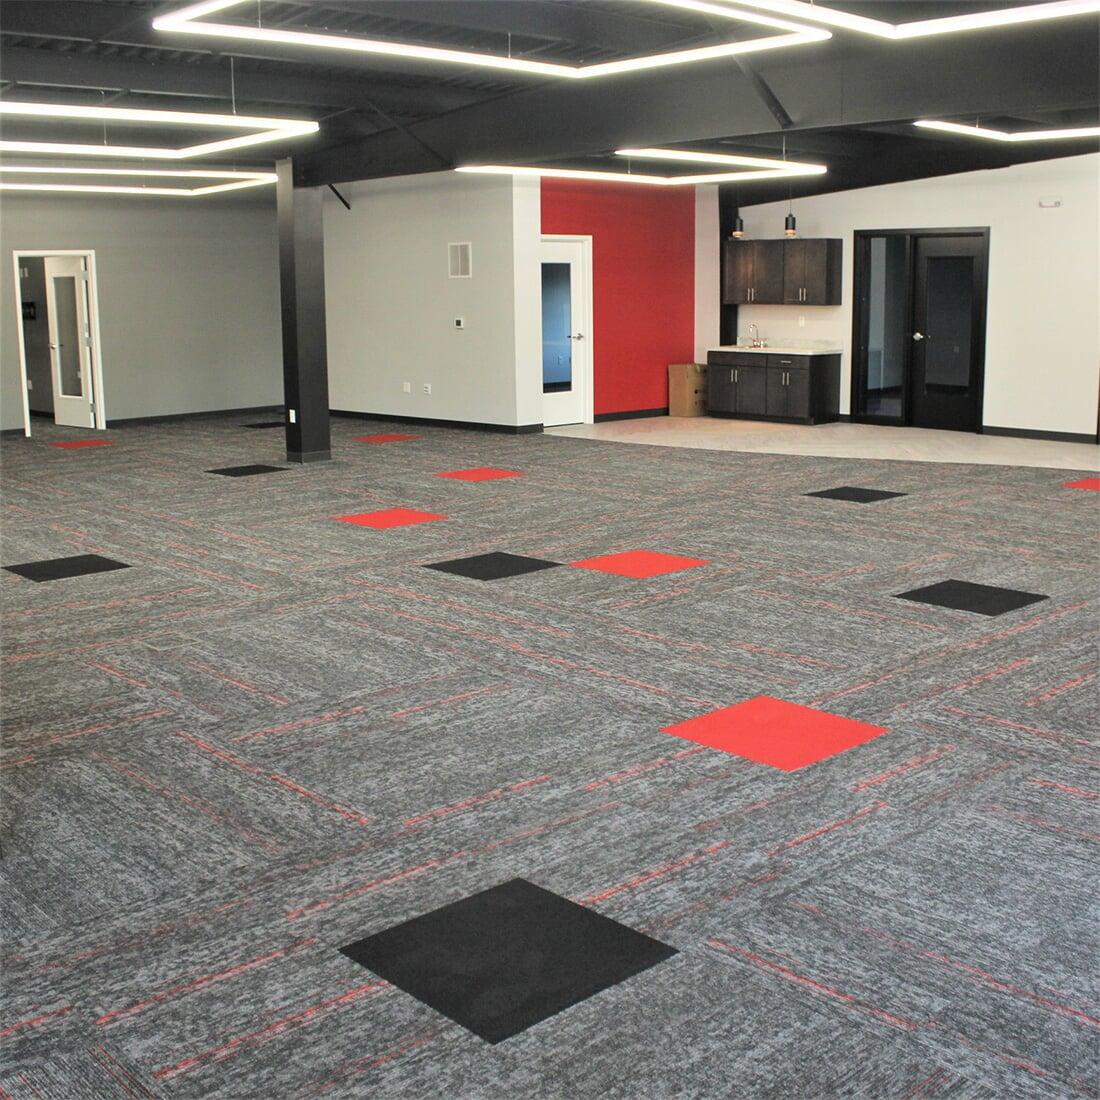 Carpet tiles in Harrisburg, PA from Nolt's Floor Covering, Inc.